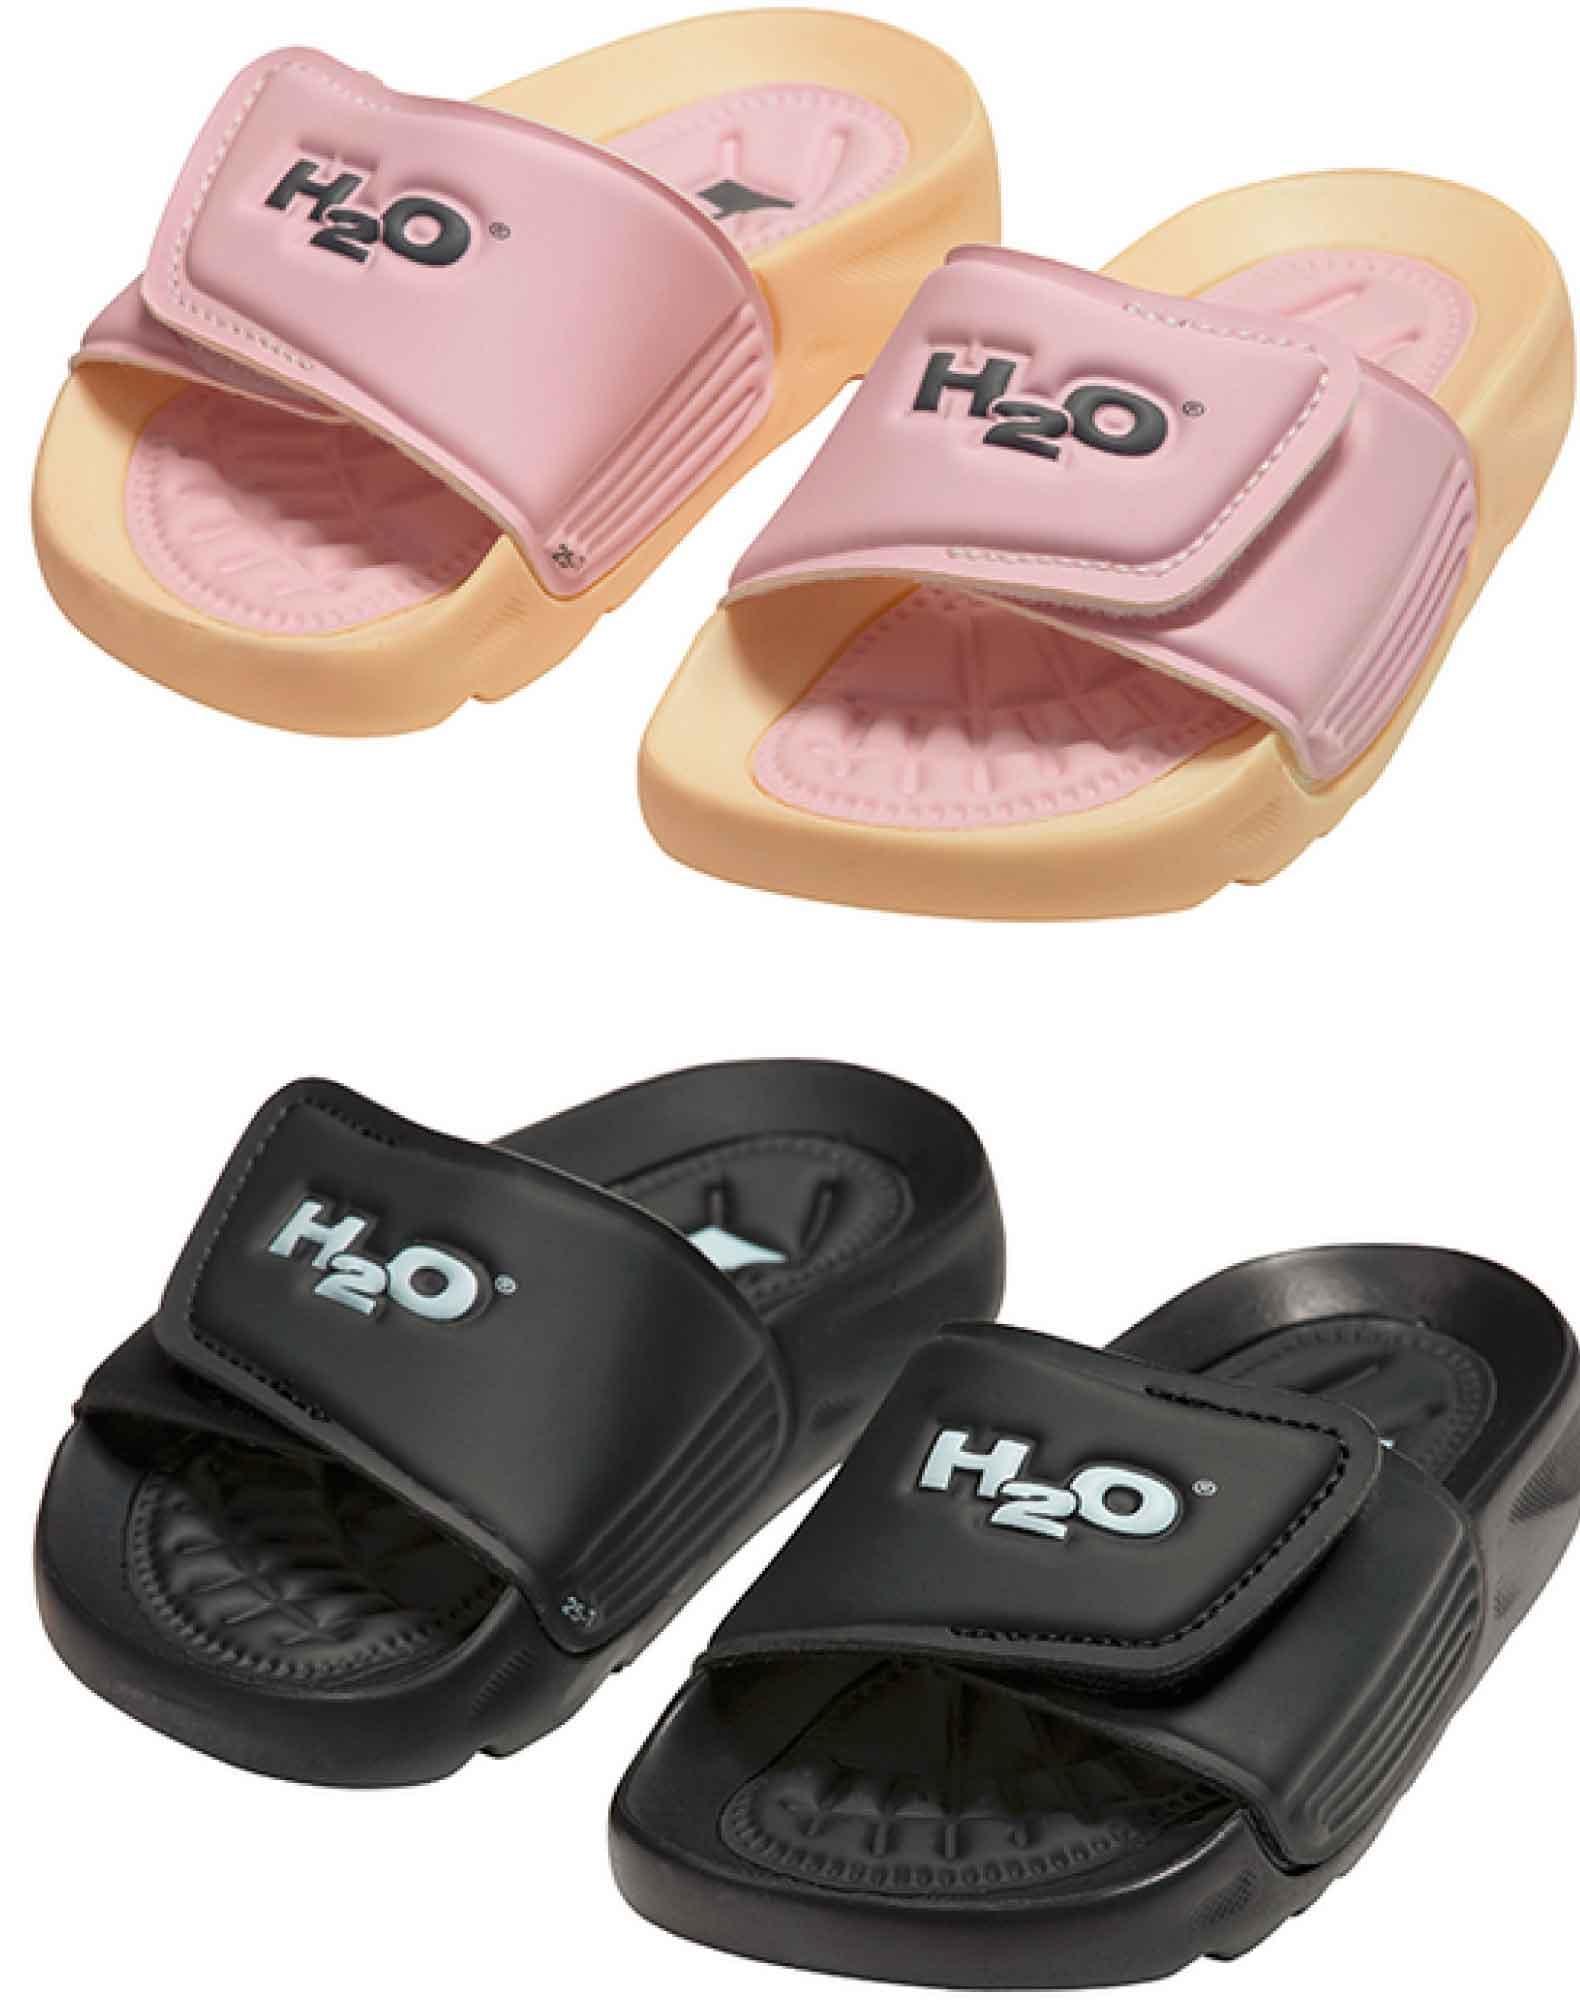 dame sandaler tilbud